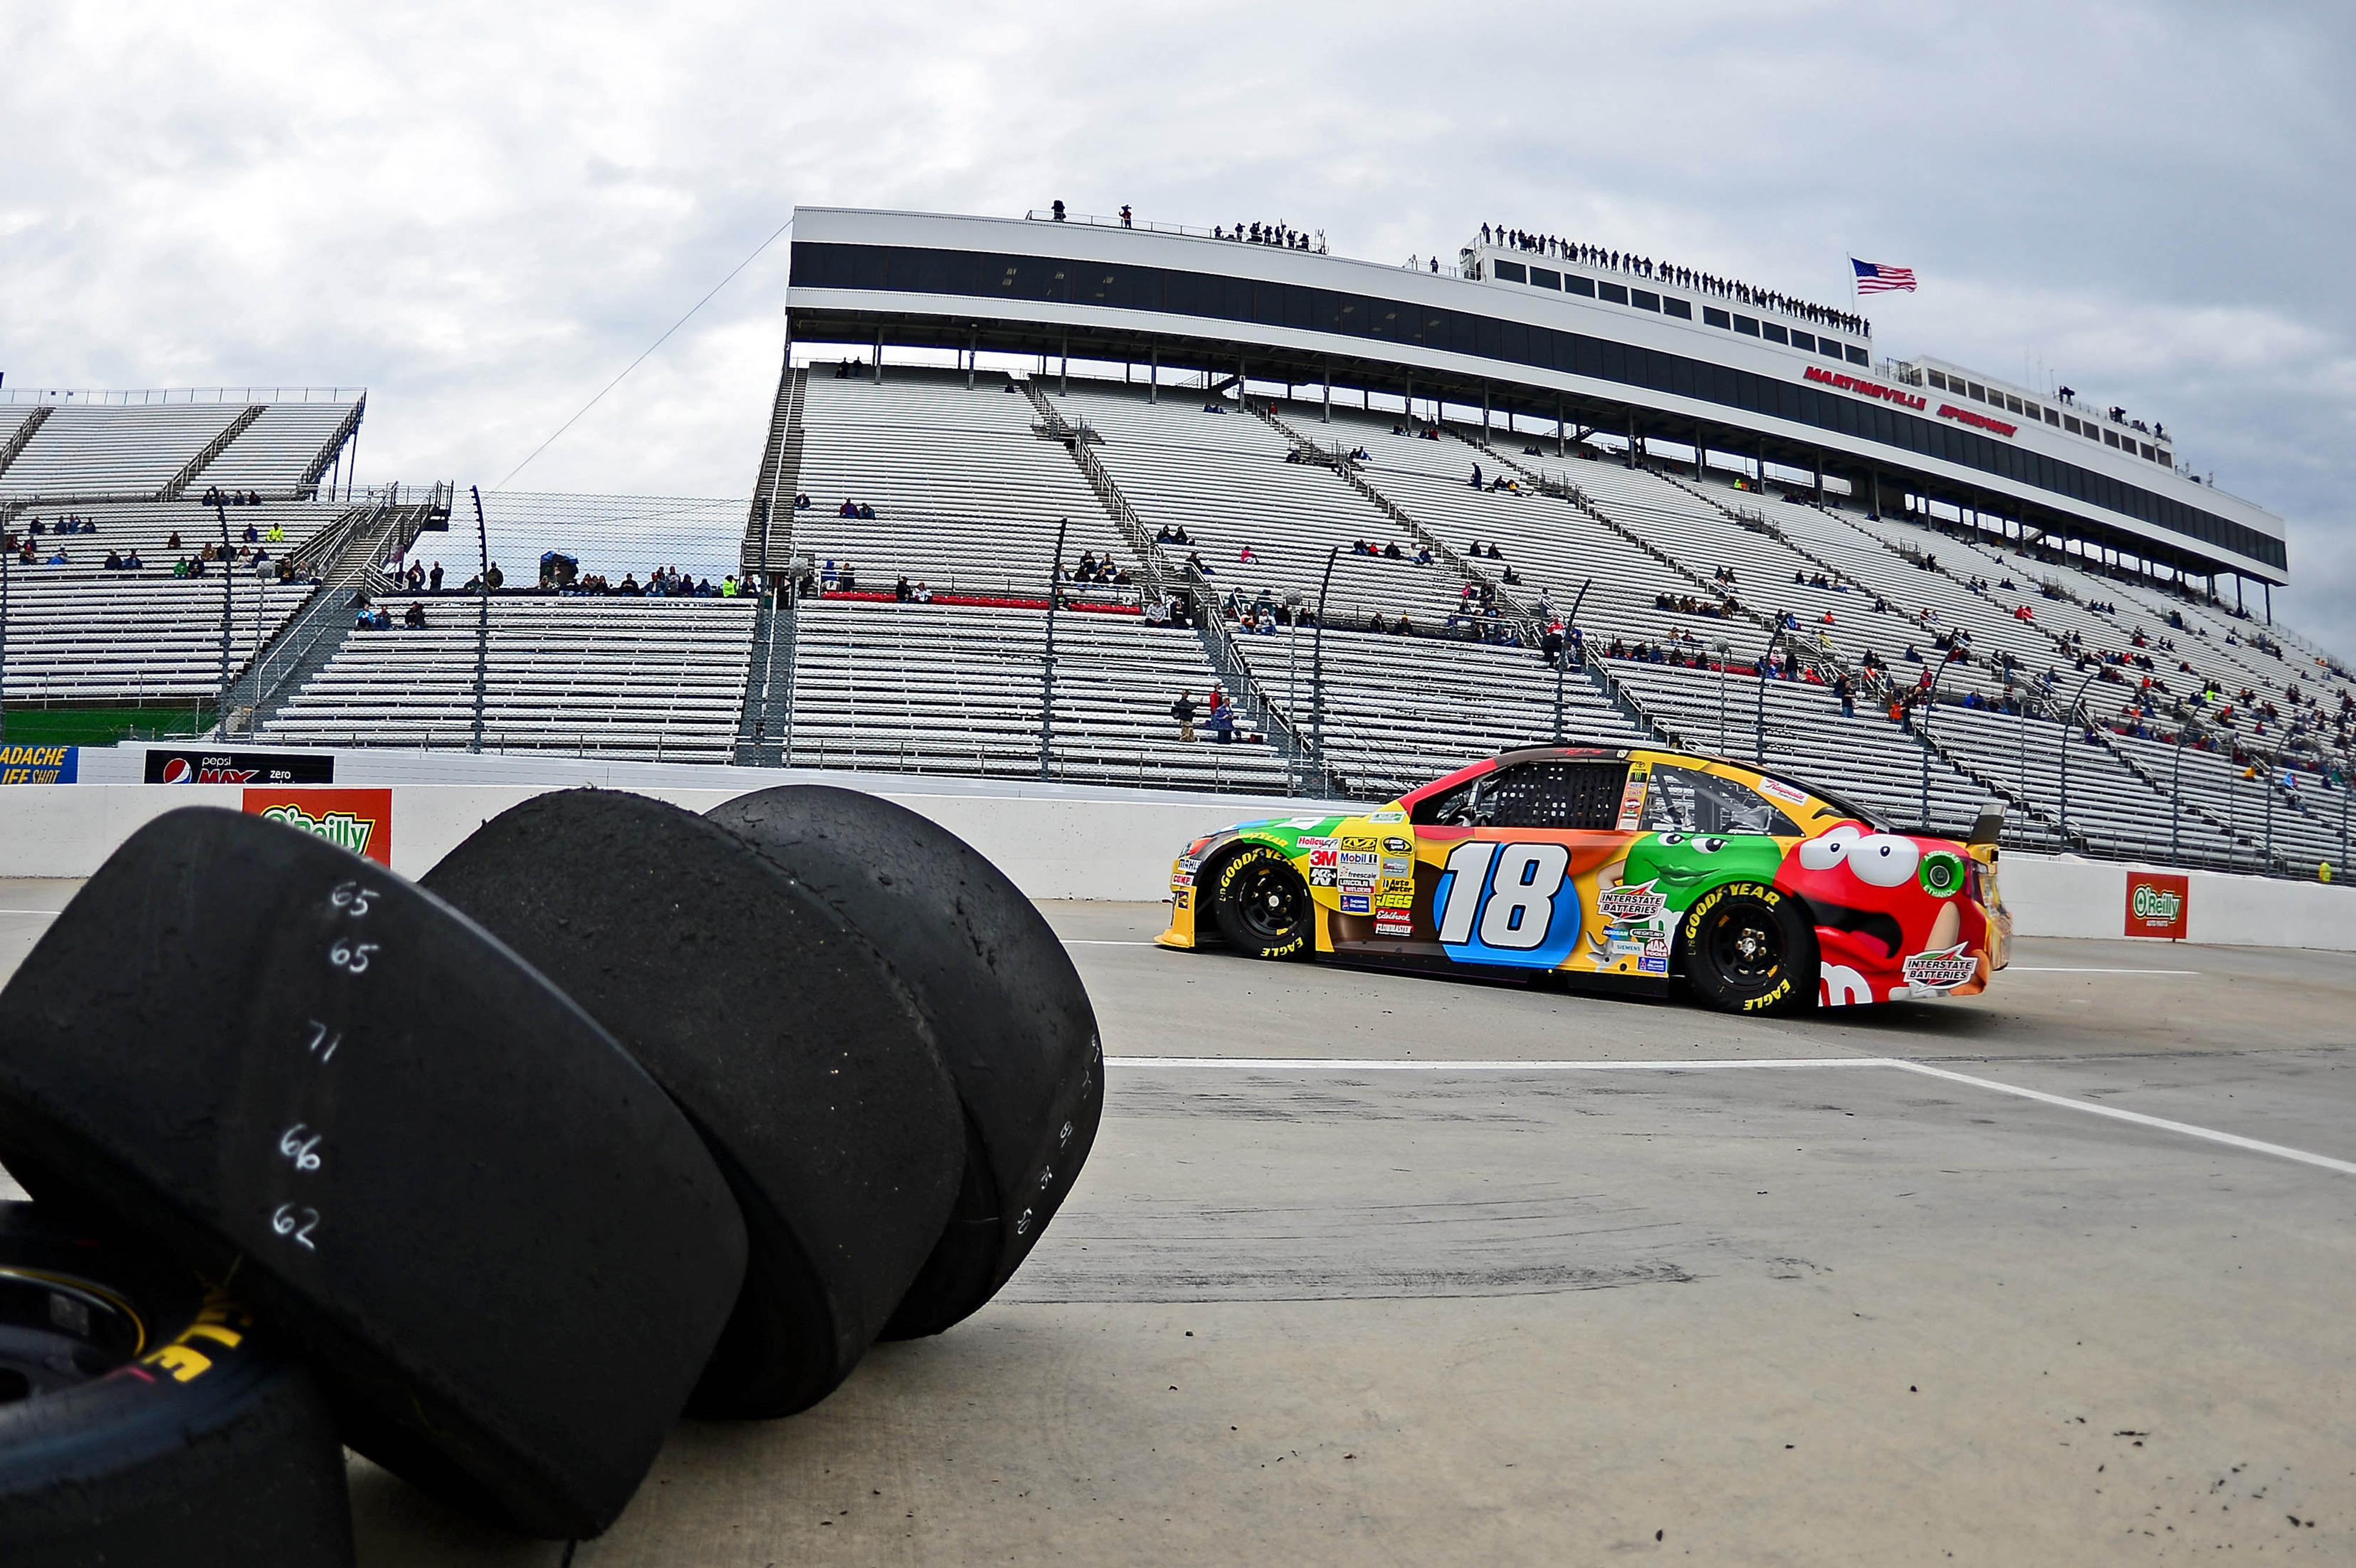 NASCAR Martinsville 2014: Lineup, starting grid for STP 500